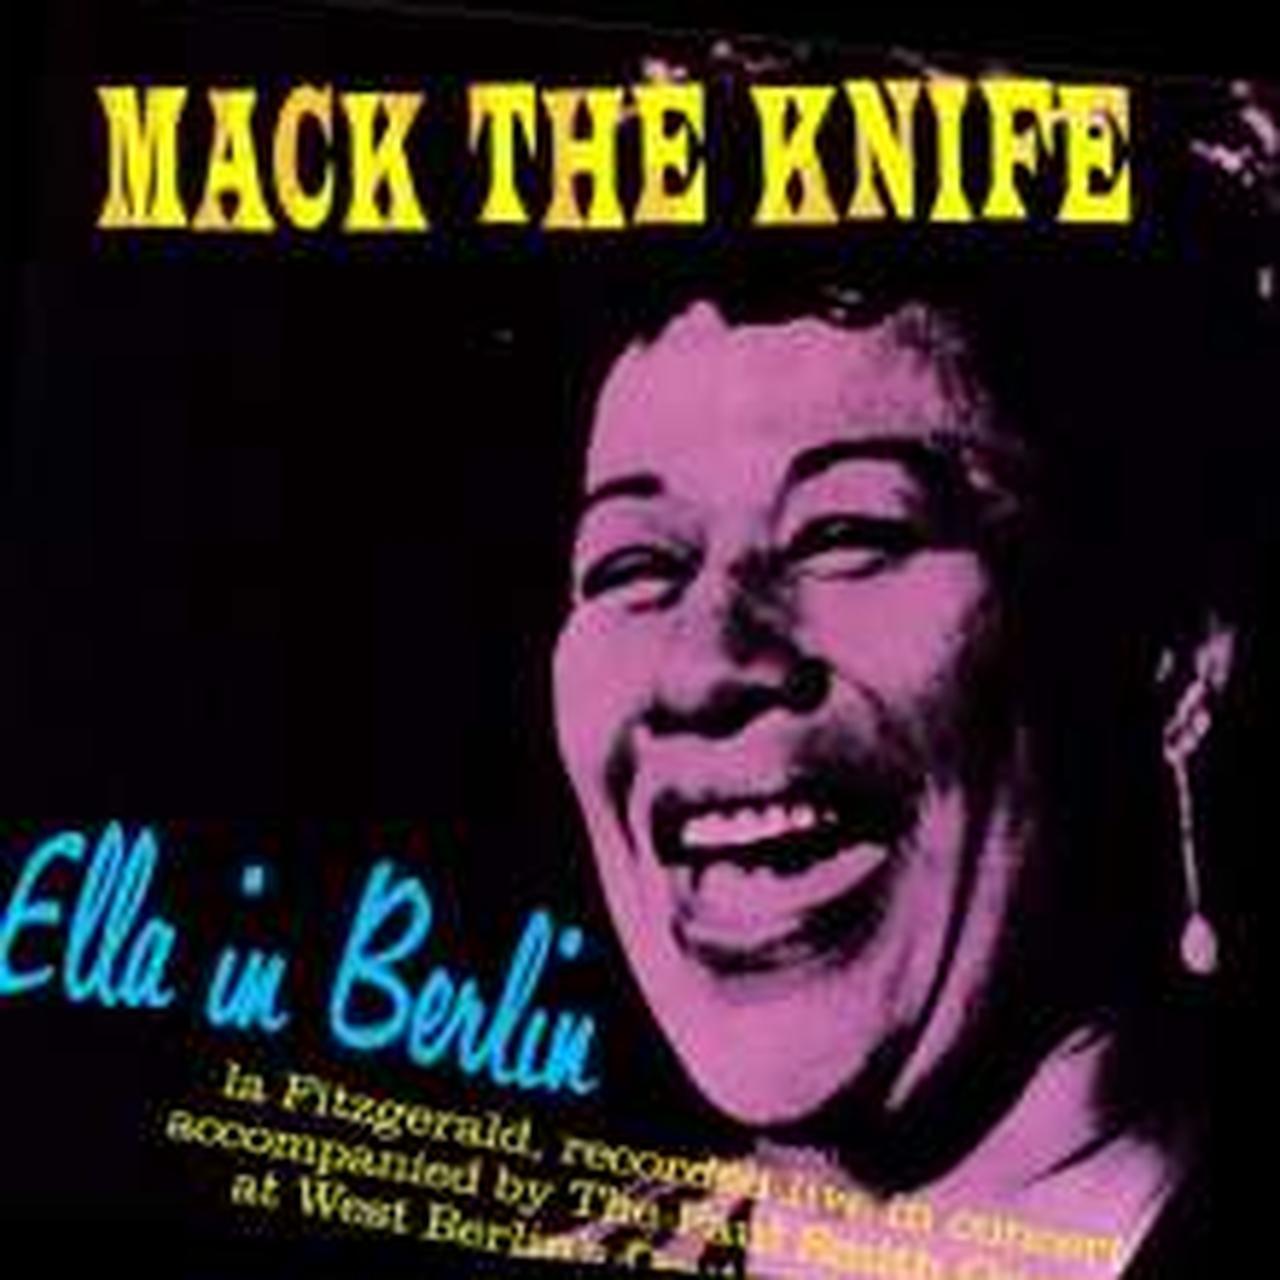 Ella Fitzgerald Mack The Knife Ella In Berlin Vinyl Record